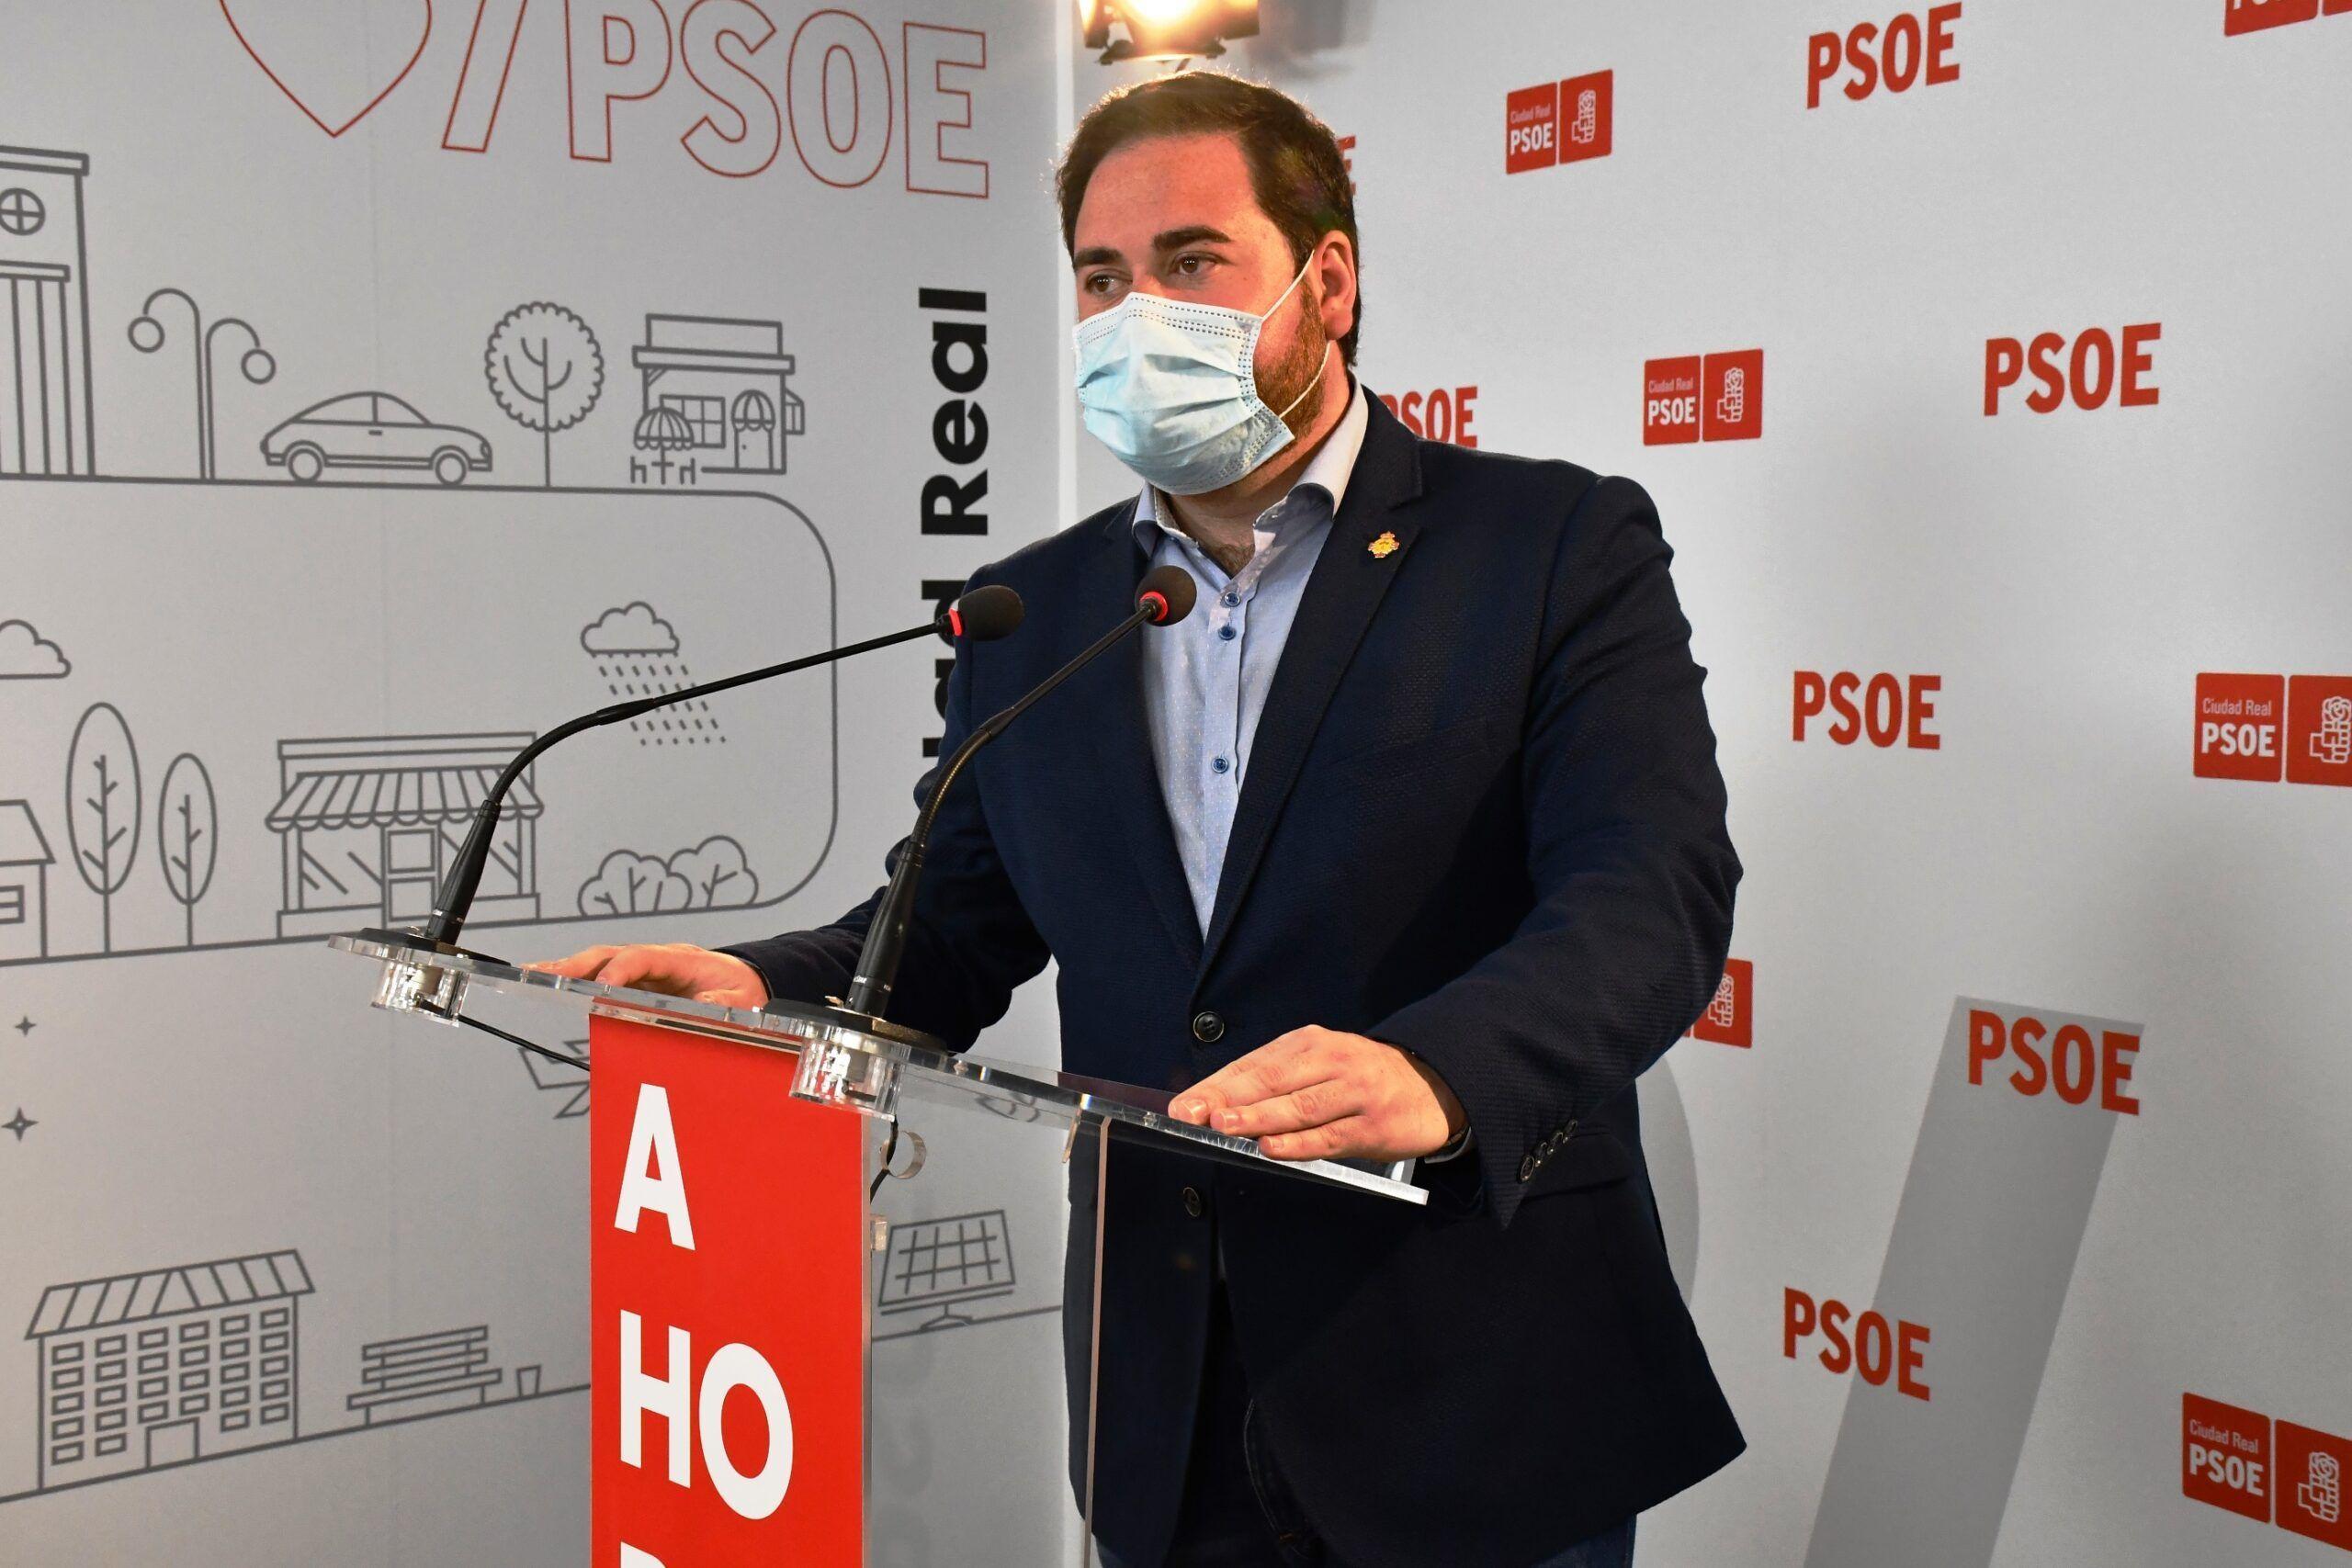 El PSOE celebra la bajada histórica del paro: